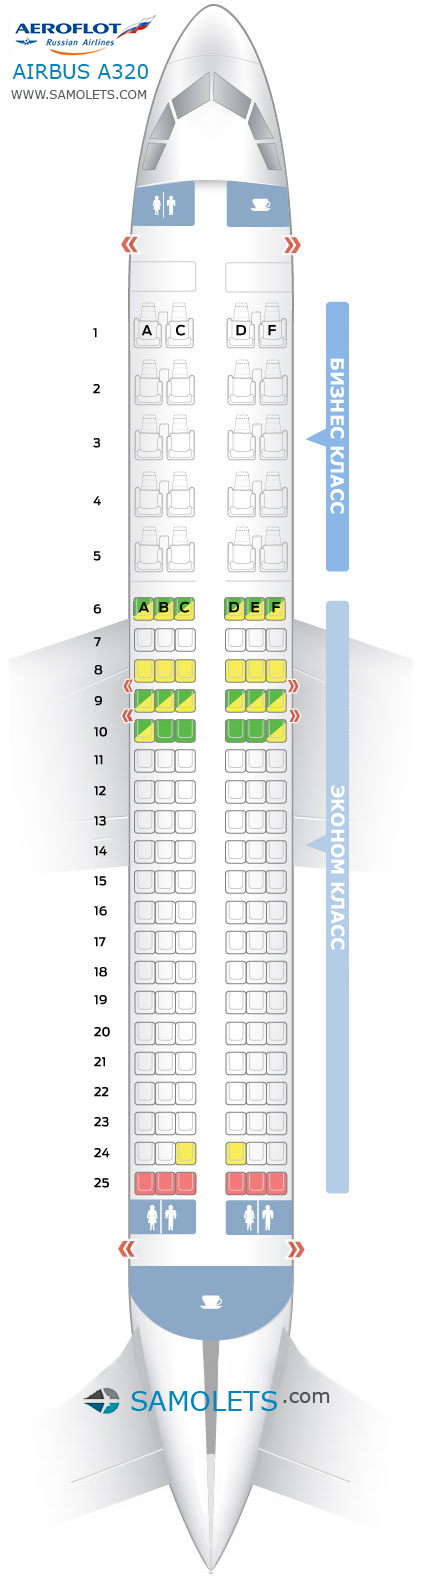 Аэробус 320 аэрофлот схема салона